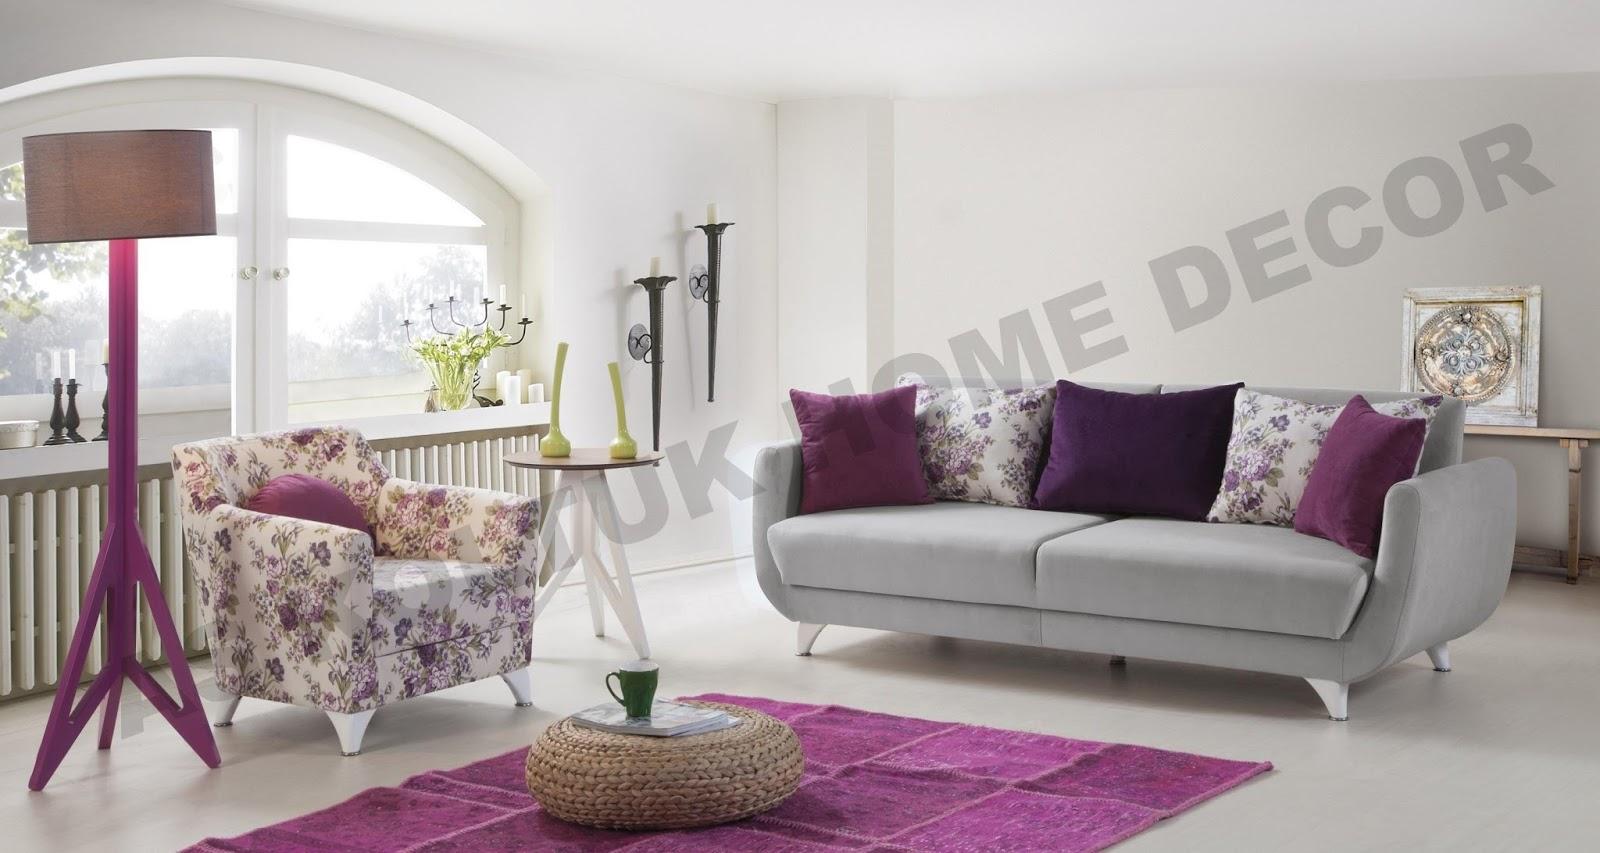 Home Decor For Sale: AS Koltuk Home Decor: For Sale